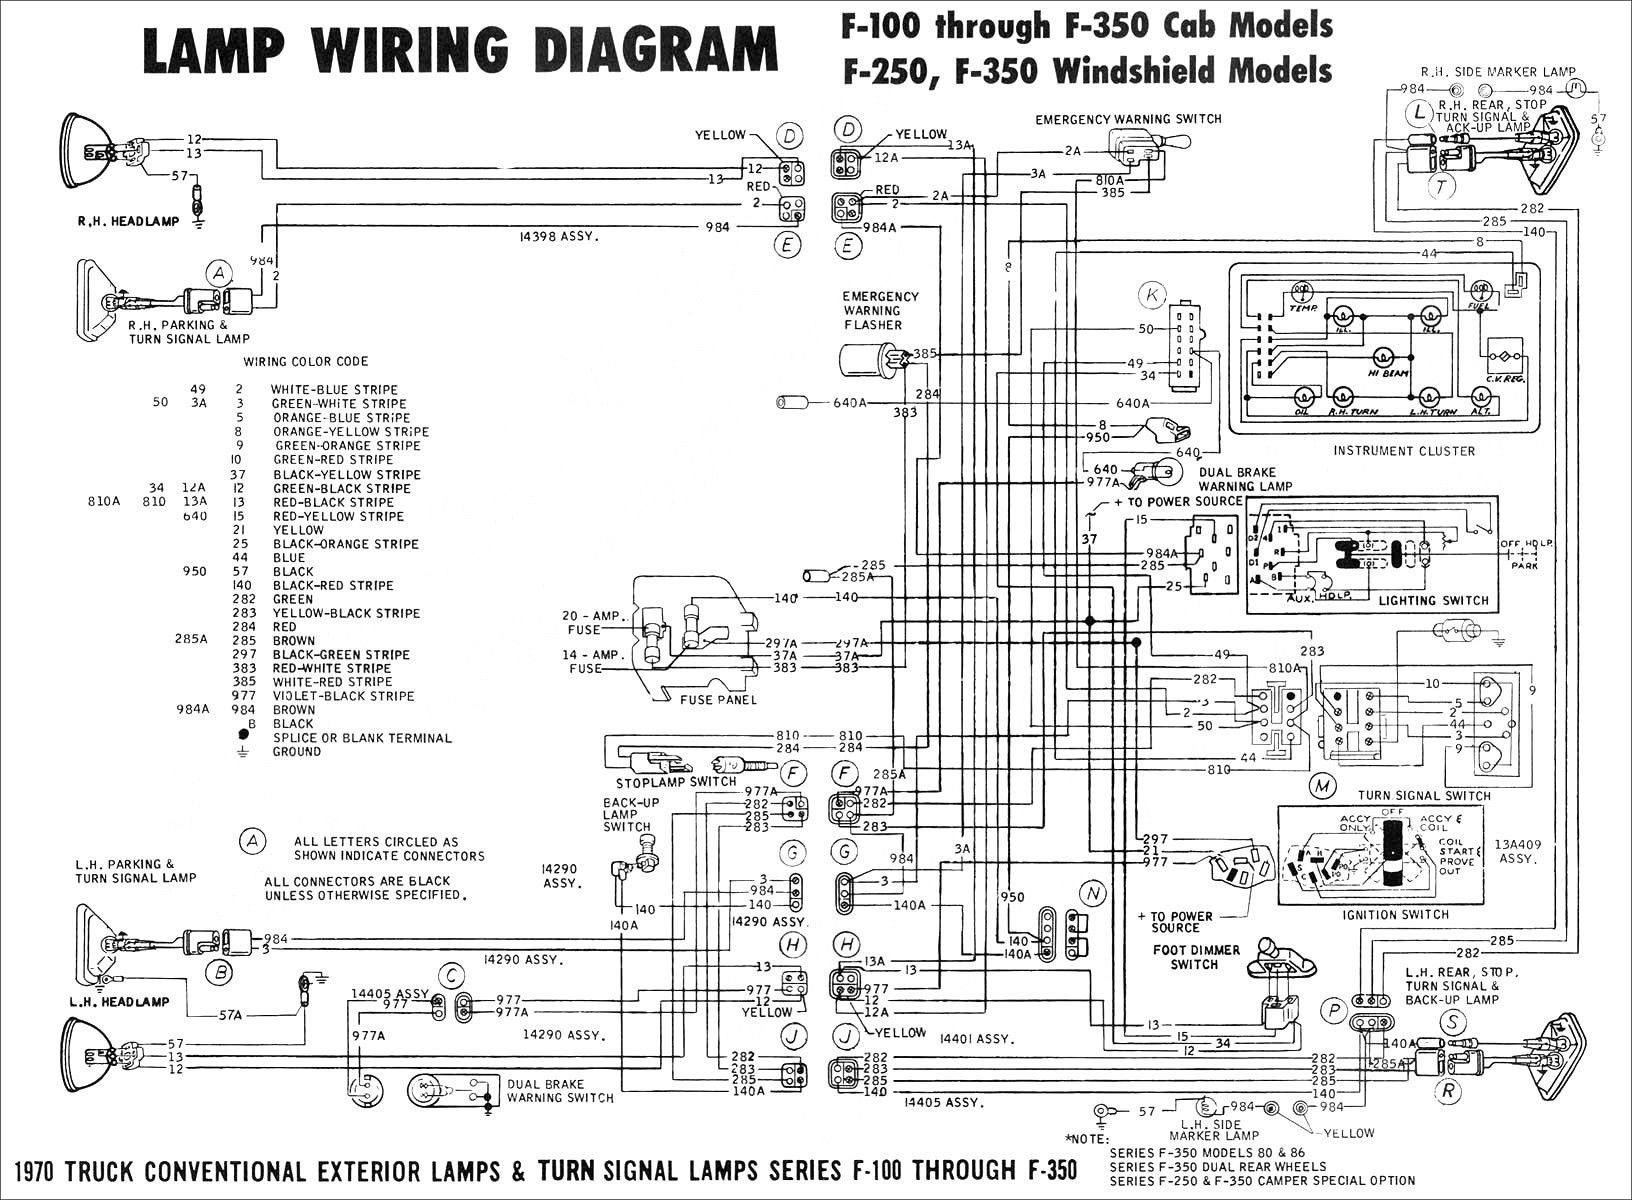 2005 Nissan Altima Turn Signal Wiring Diagram